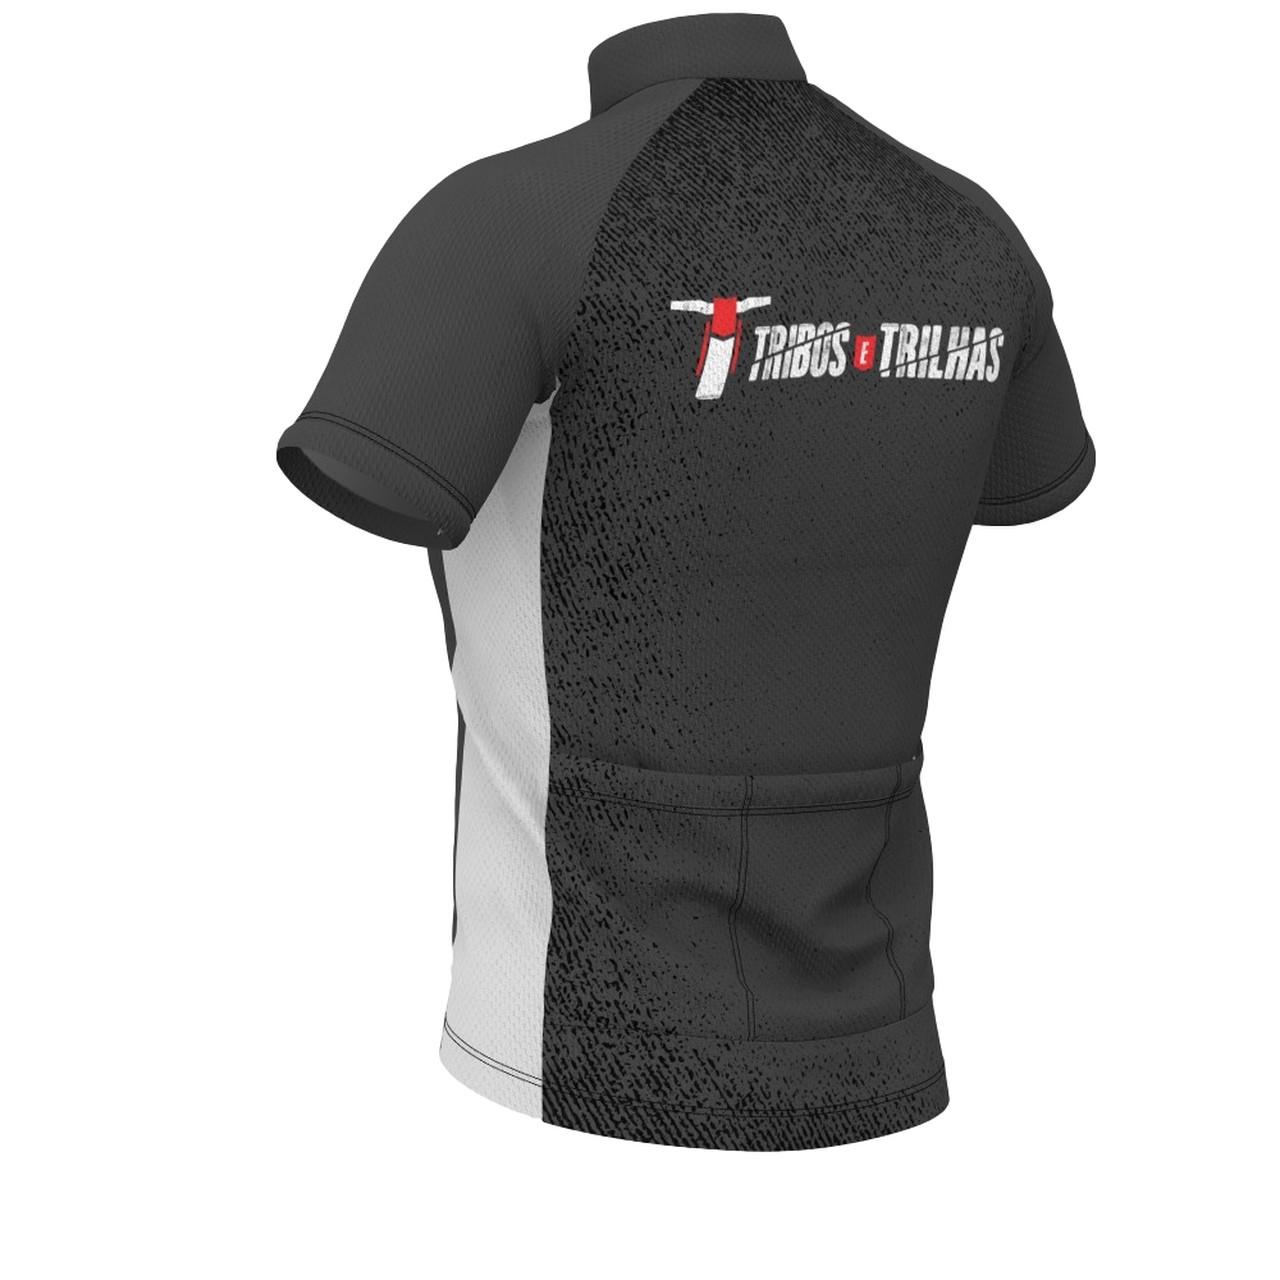 Camisa Bike Tribos e Trilhas Dry Tech Grey